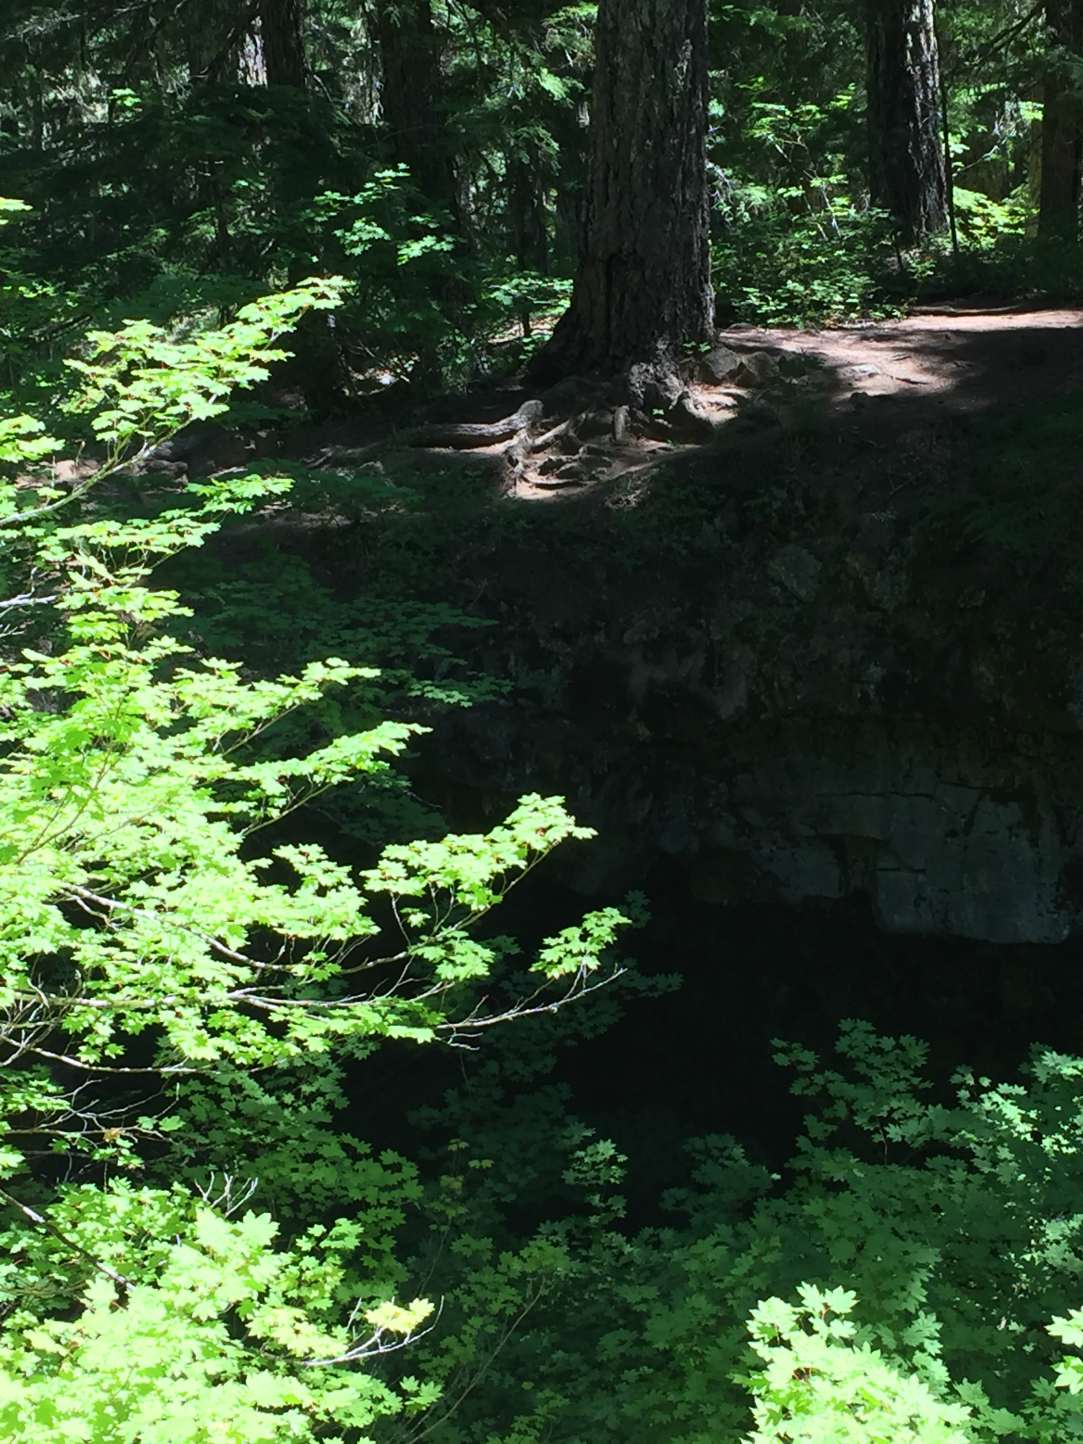 Natural Bridges Rock Formation